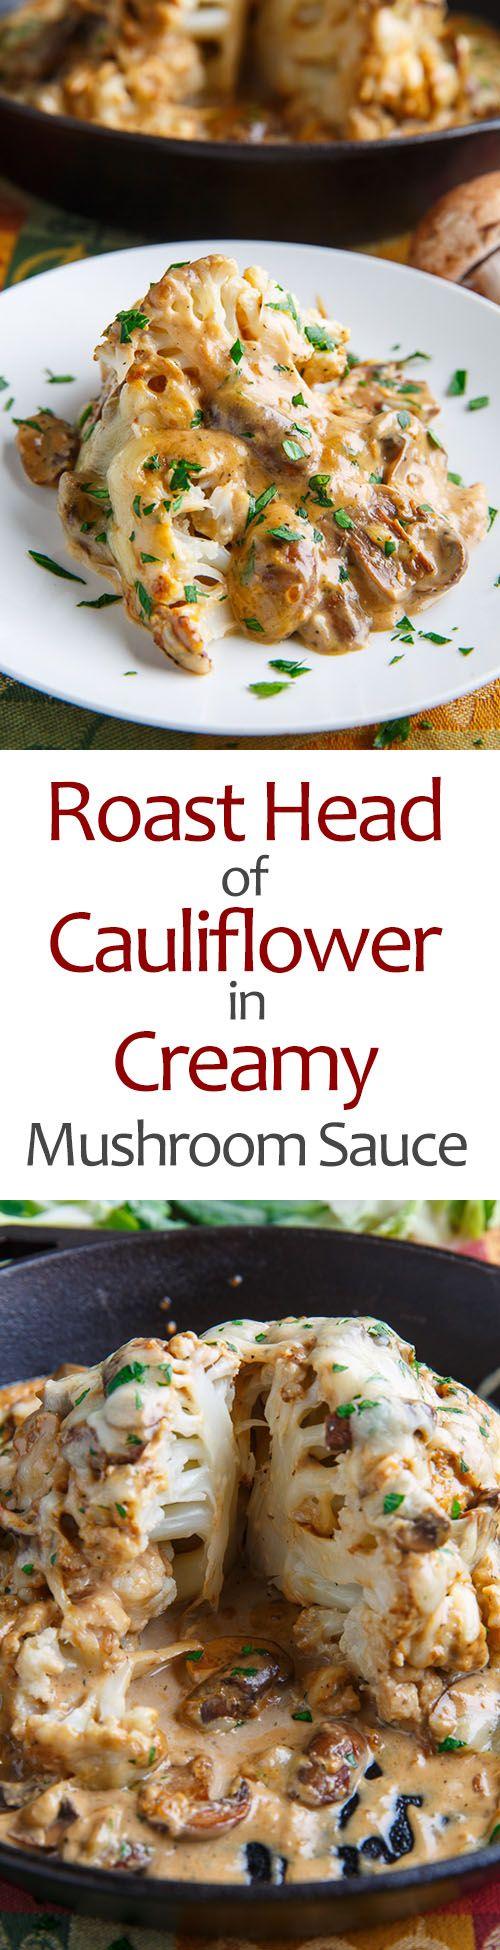 Vegan Roast Head of Cauliflower in Creamy Mushroom Sauce Recipe www.VeganFoodDaily.com